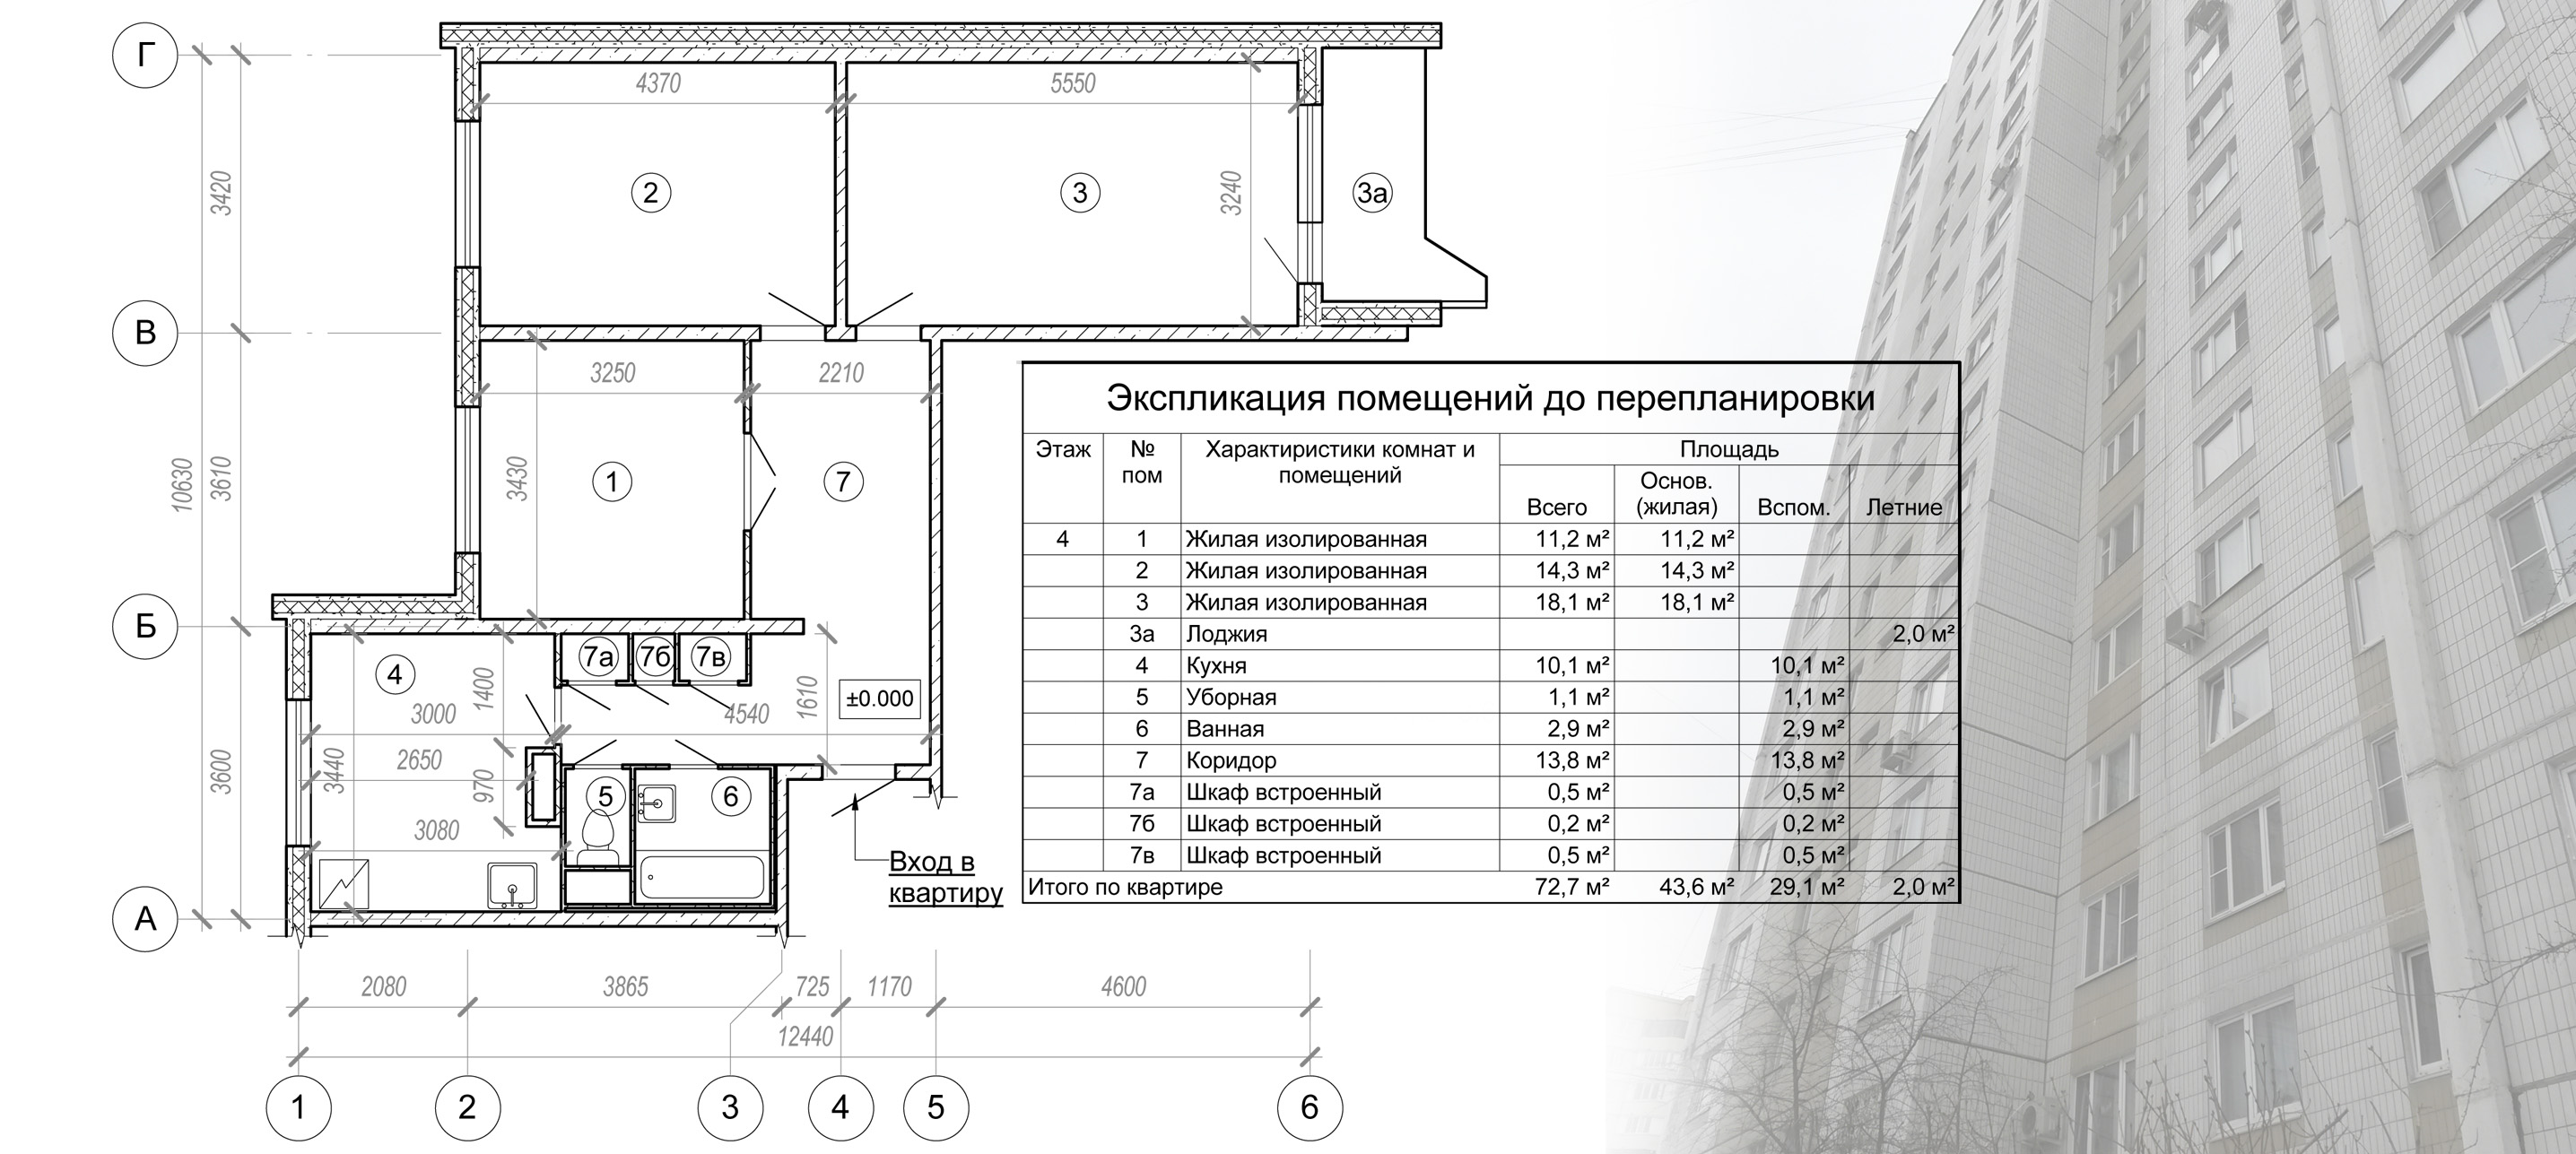 Слайд 3-1.jpg